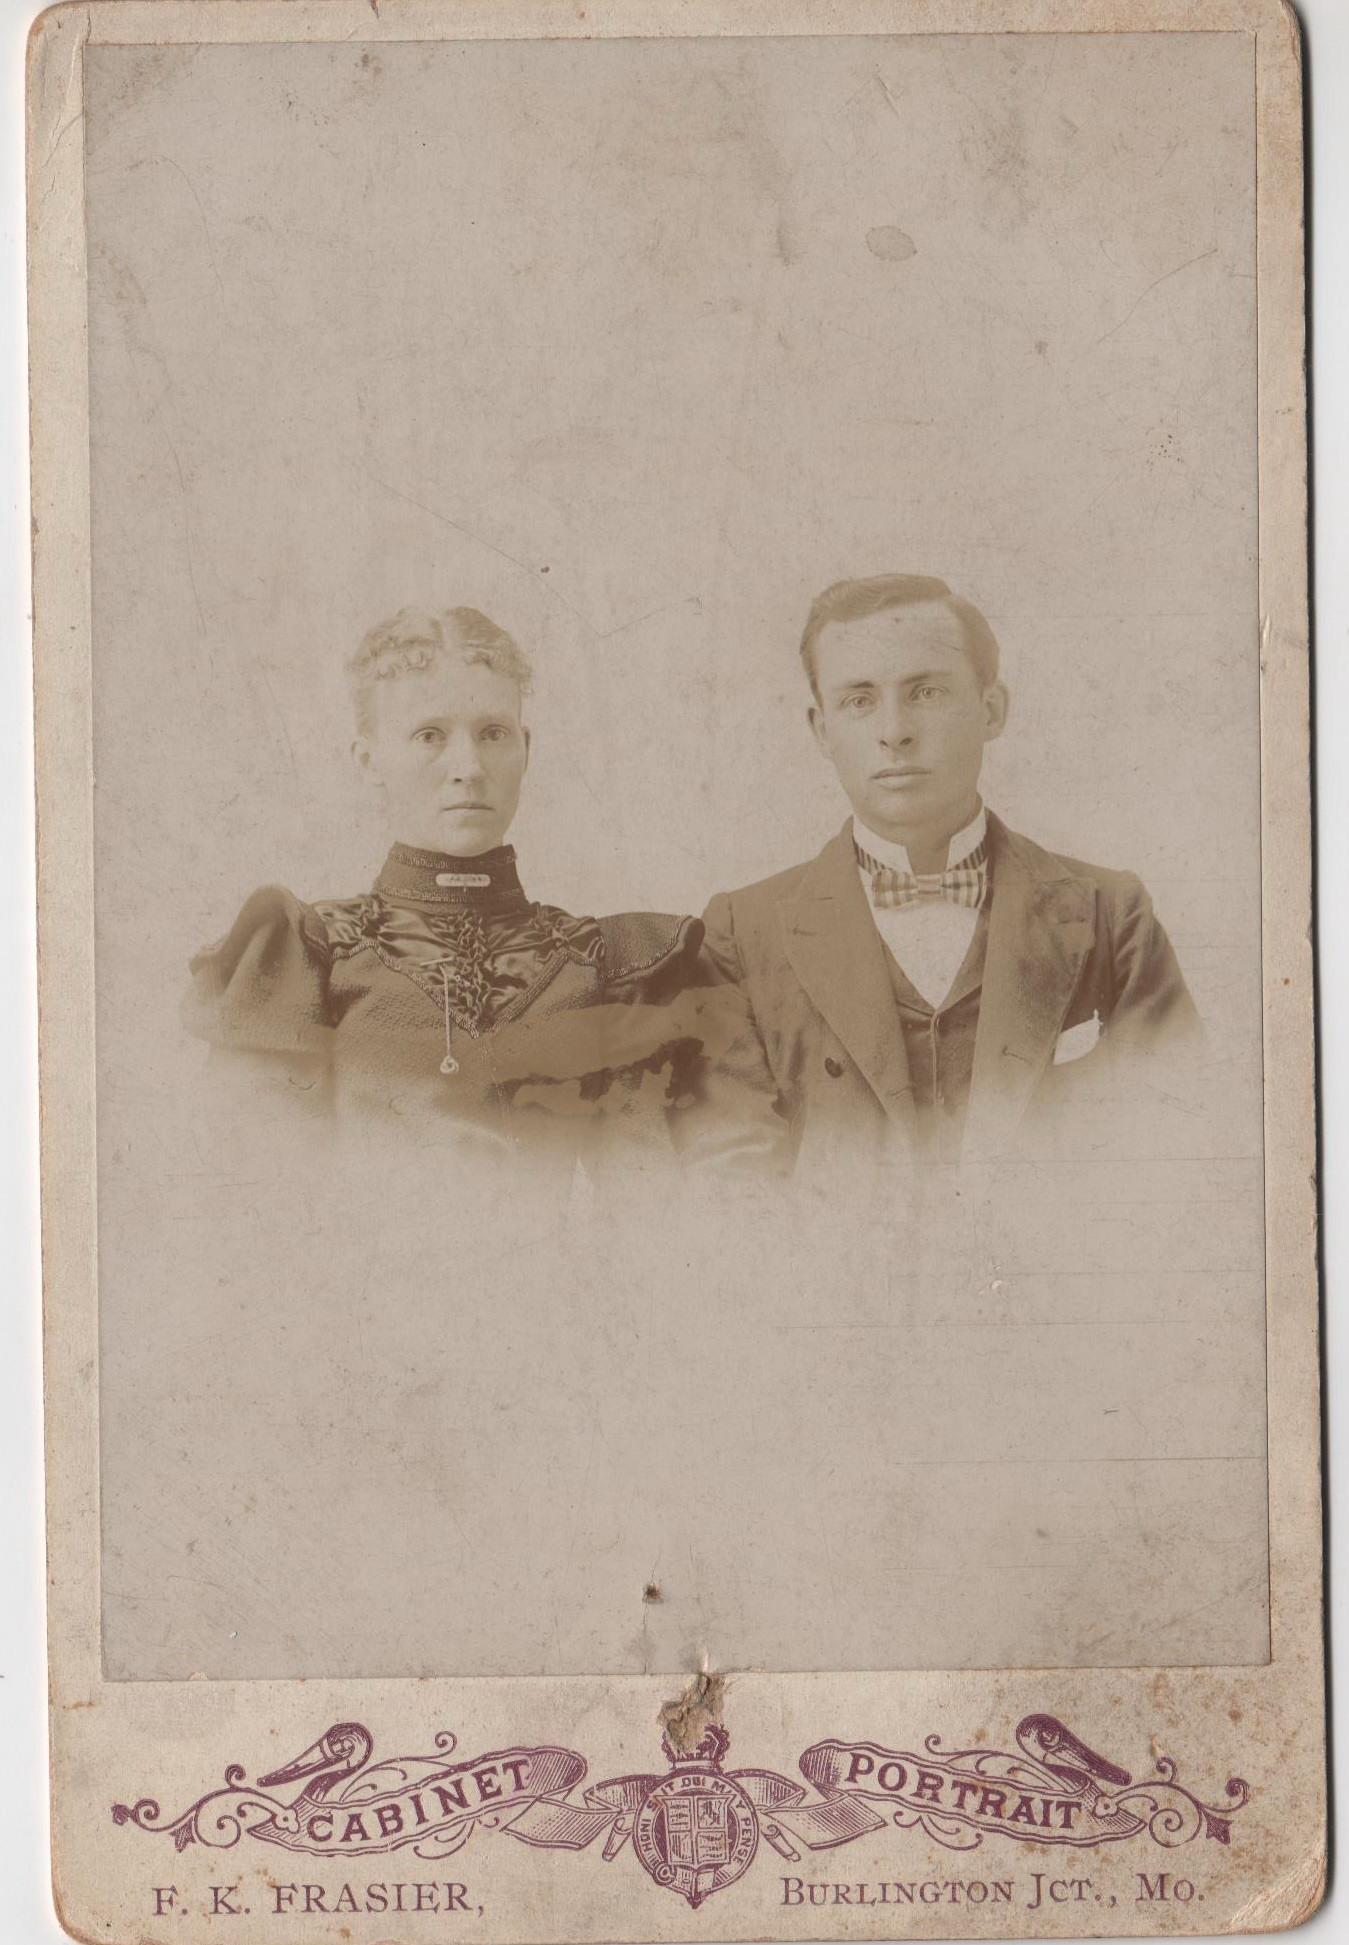 William Harrison Howell